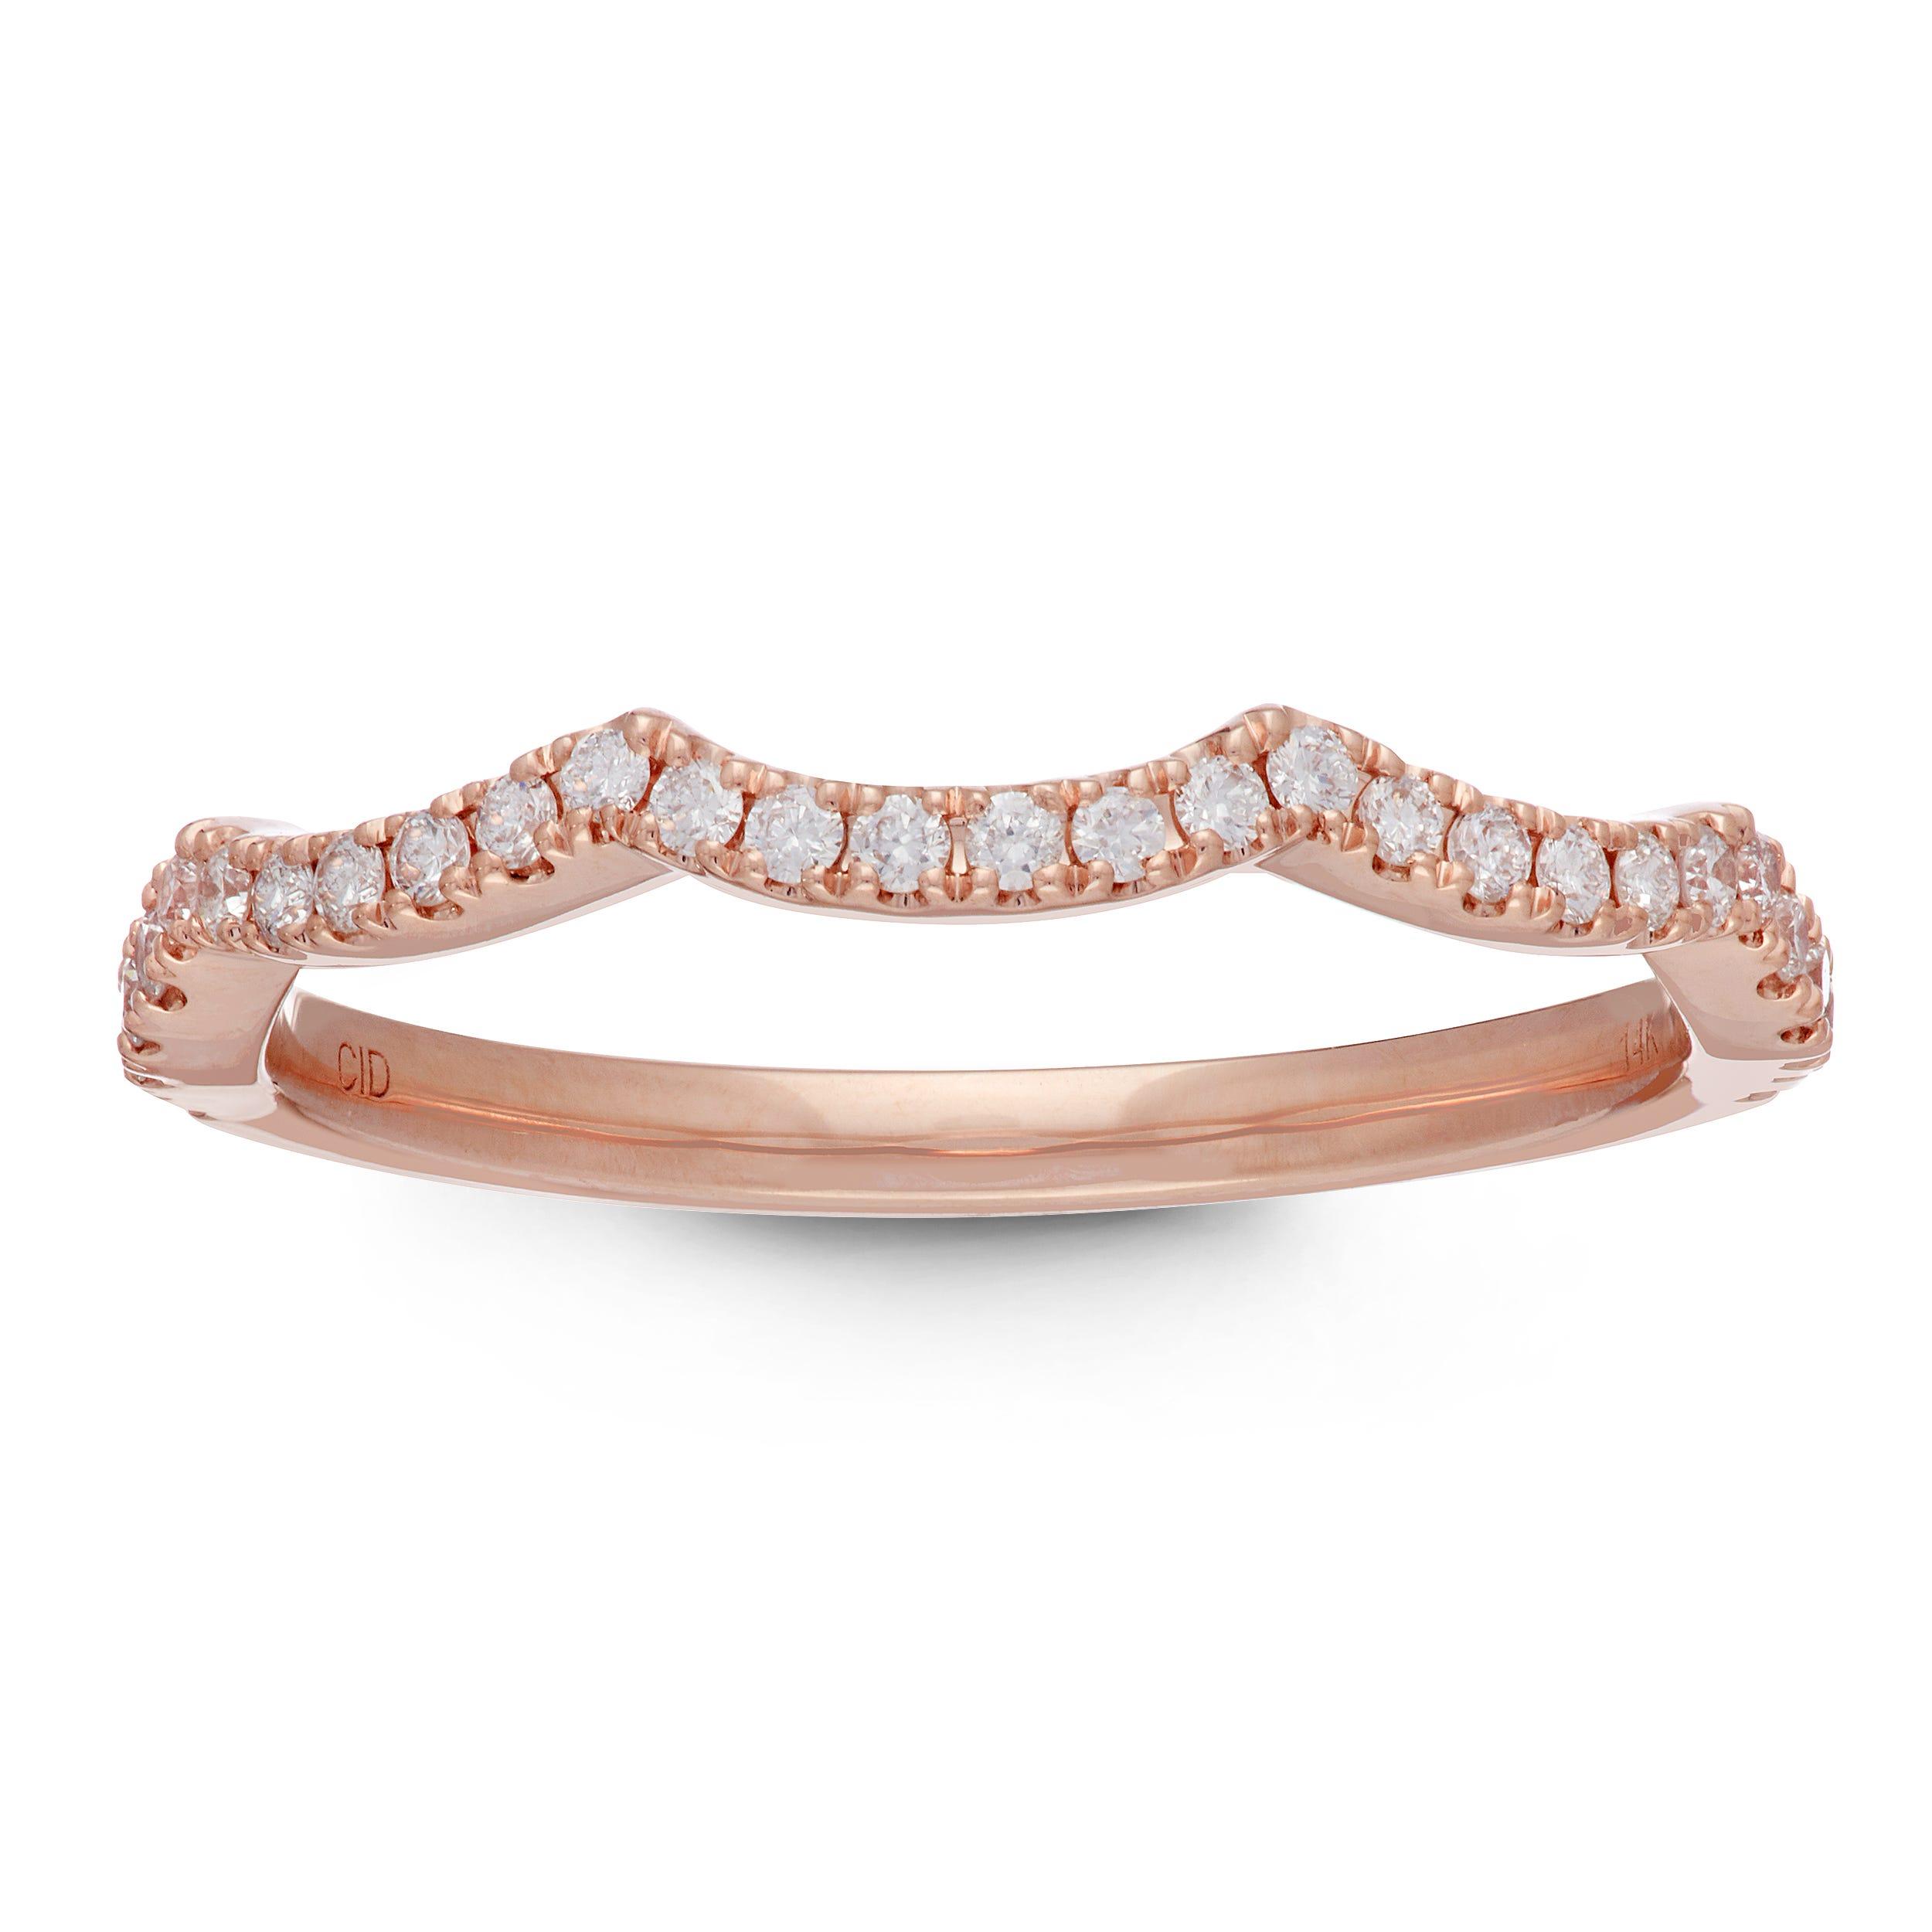 Diamond Wedding Band 1/5ctw. In 14k Rose Gold